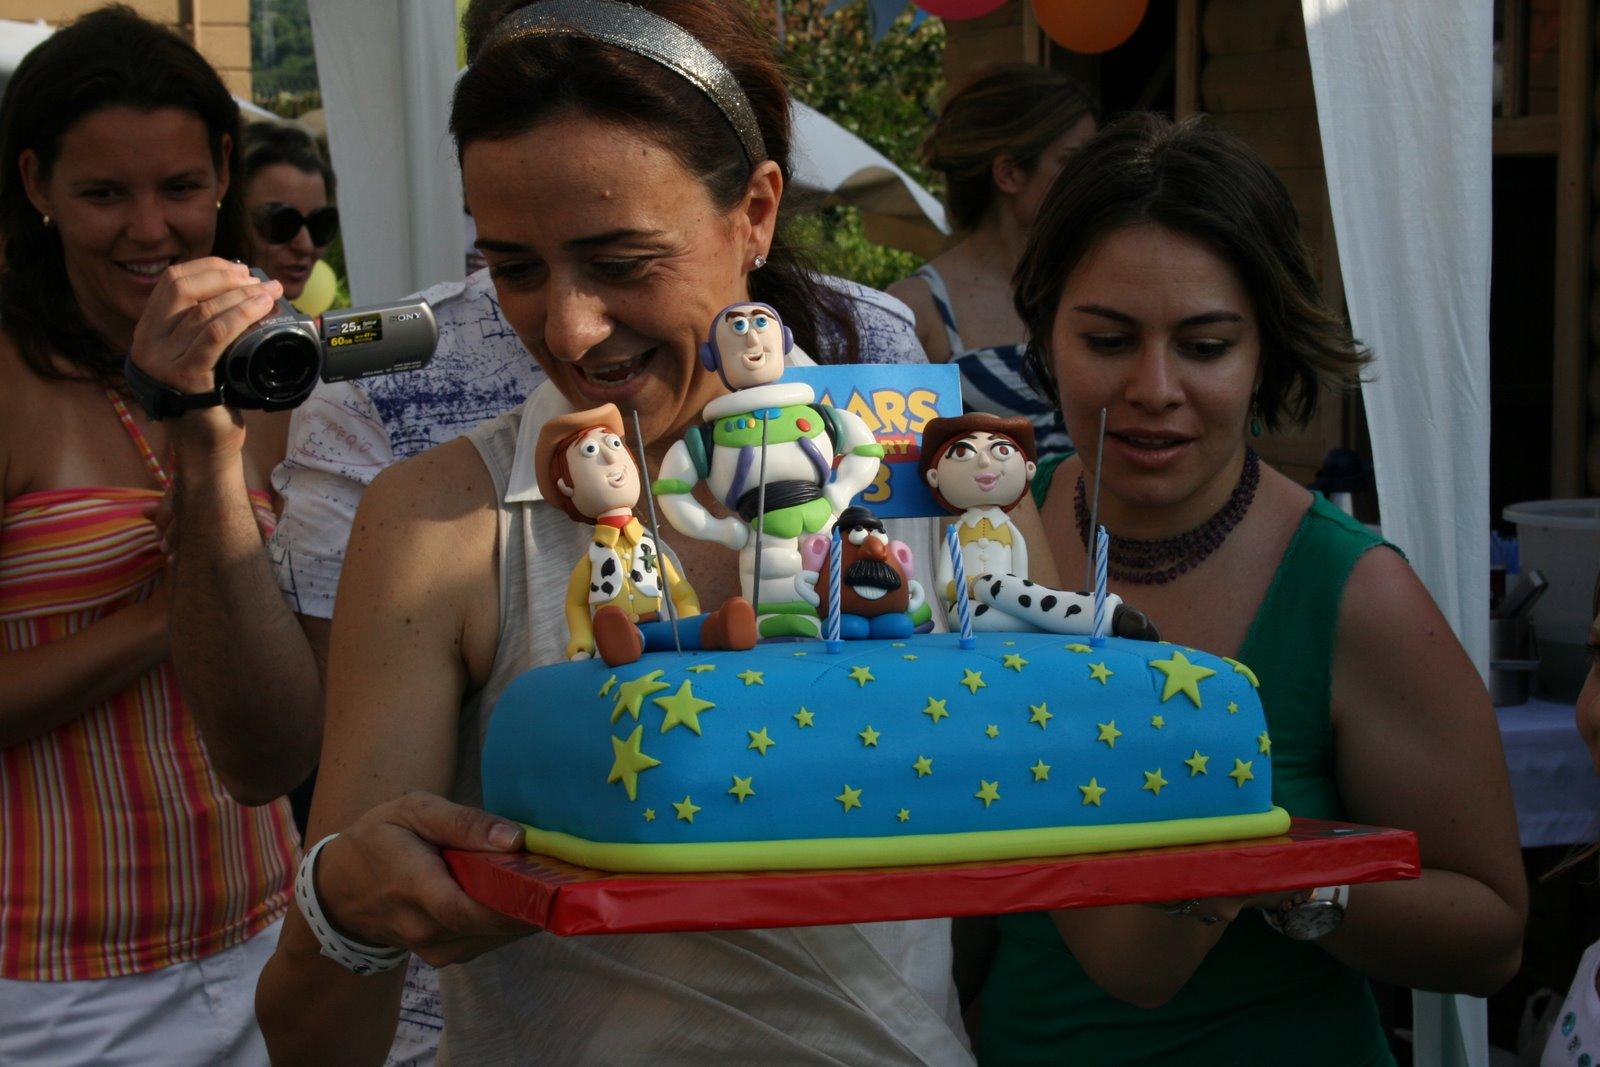 Mars ın doğum günü pastası